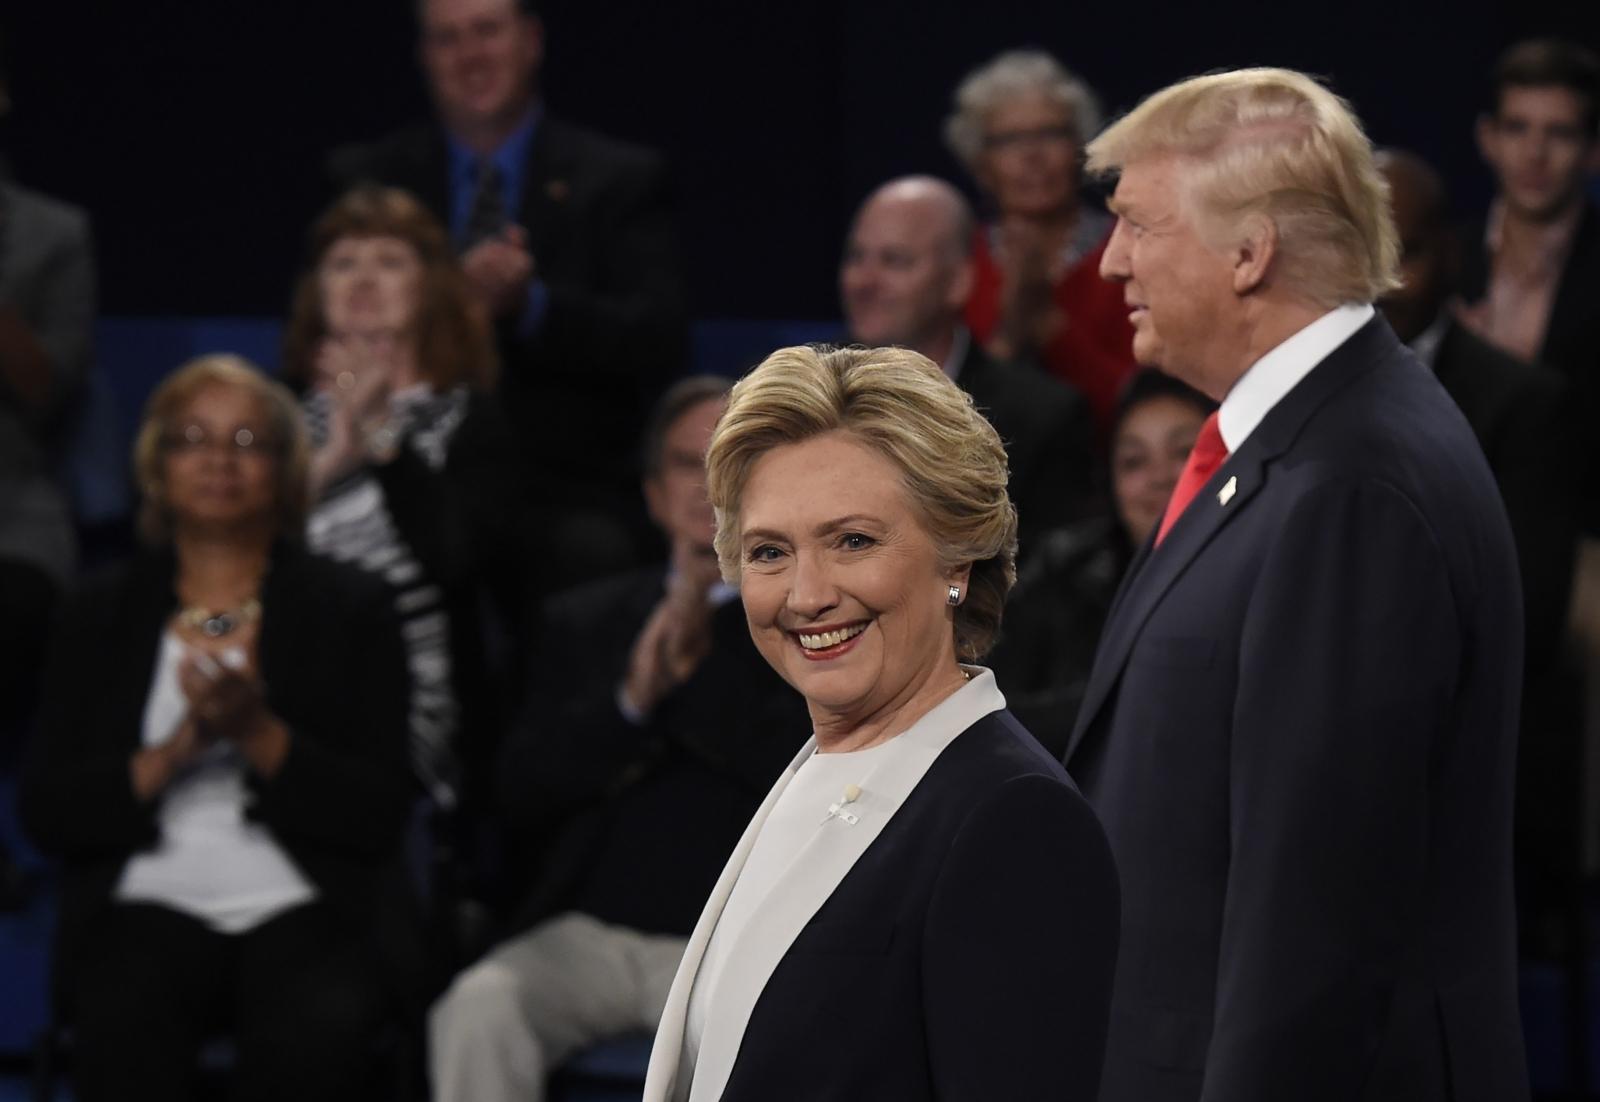 Hillary Clinton slams Donald Trump for 'racist, ignorant views' on anniversary of Haiti earthquake